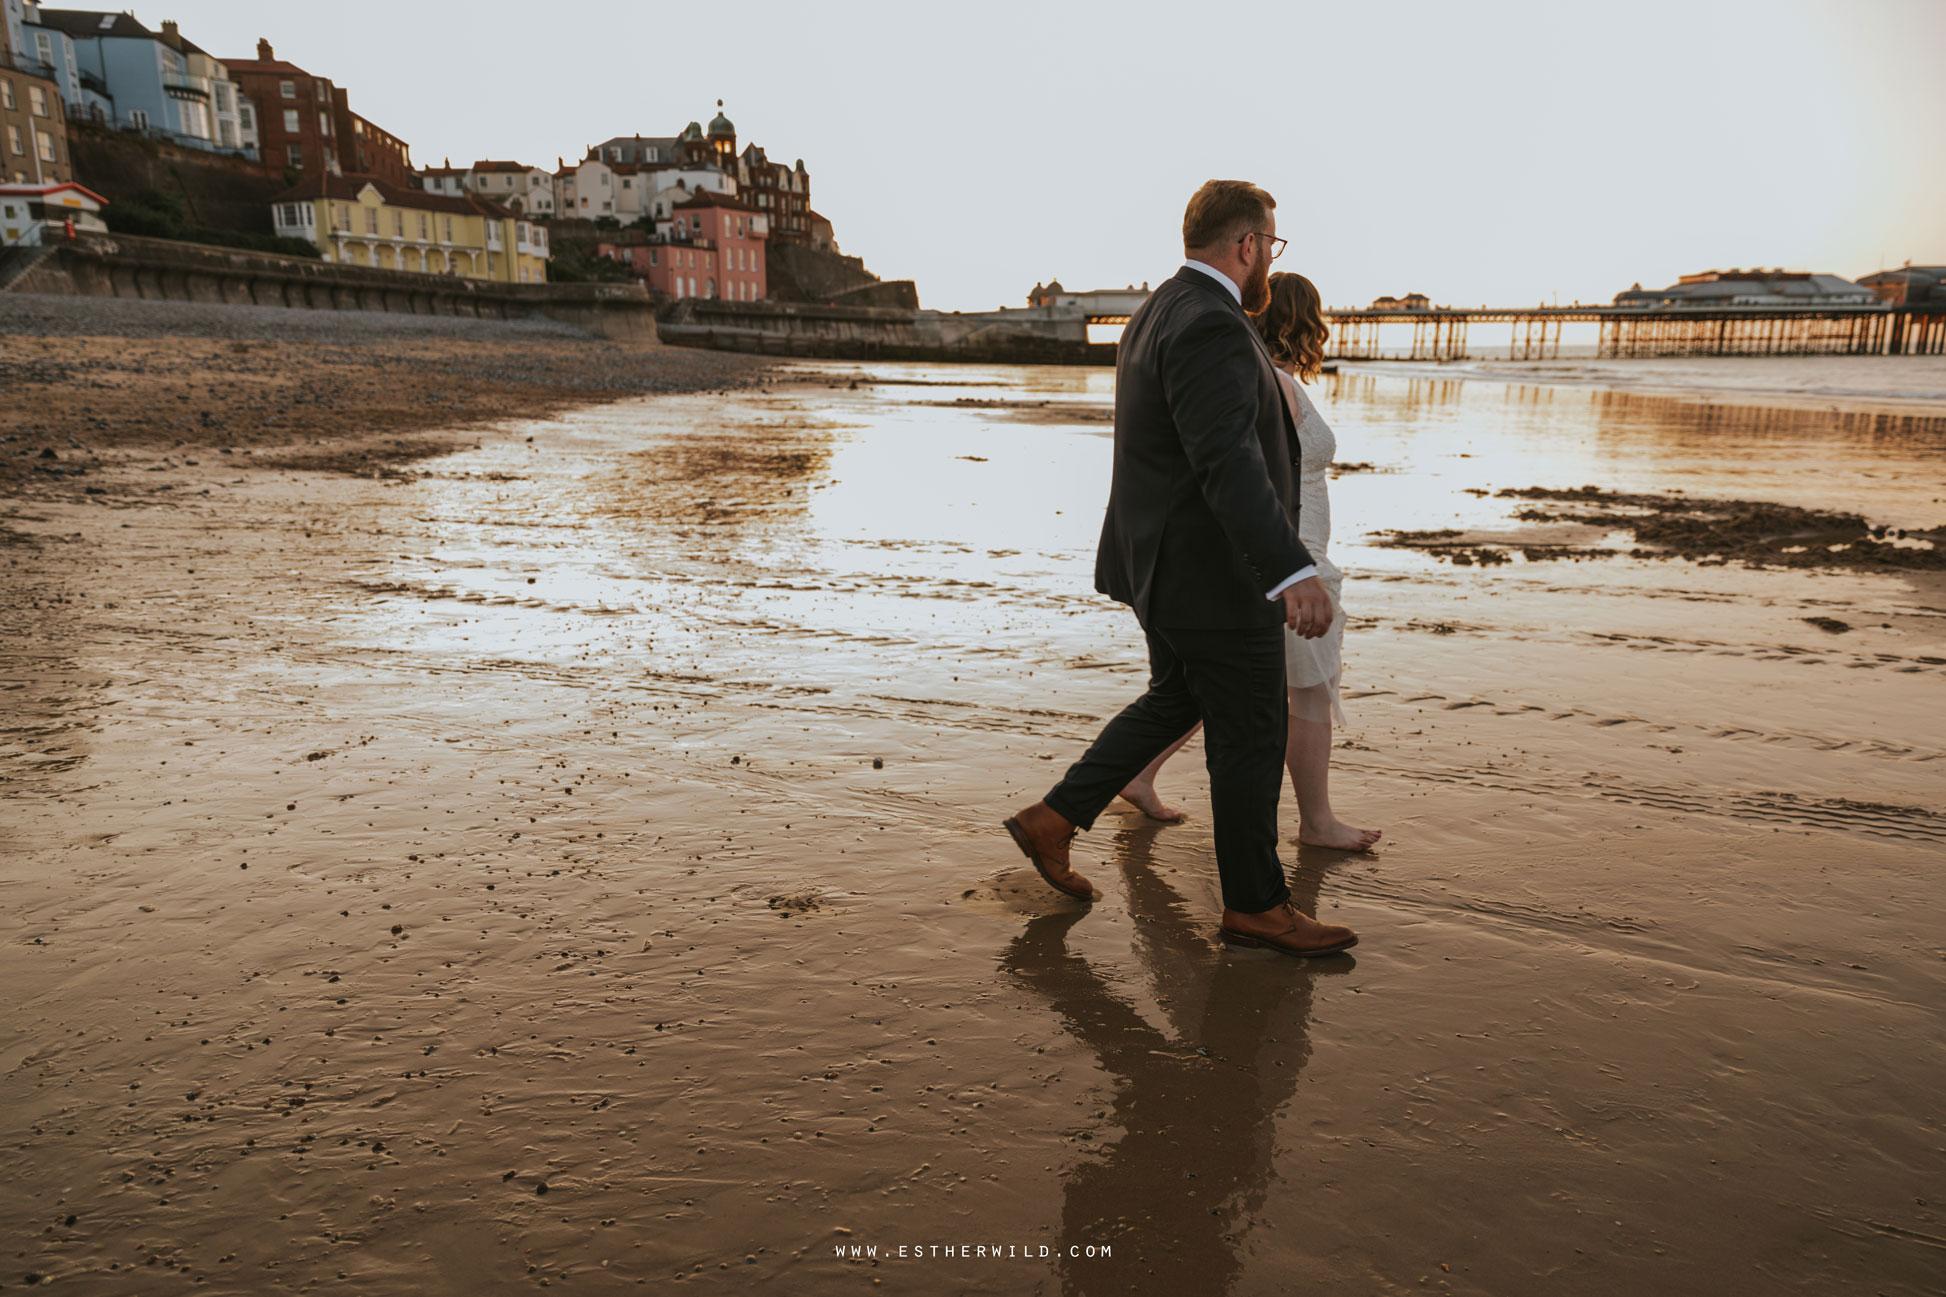 Cromer_Wedding_Beach_Outdoor_Ceremony_Norfolk_North_Lodge_Registry_Office_Rocket_House_Cafe_Cromer_Pier_IMG_4982.jpg